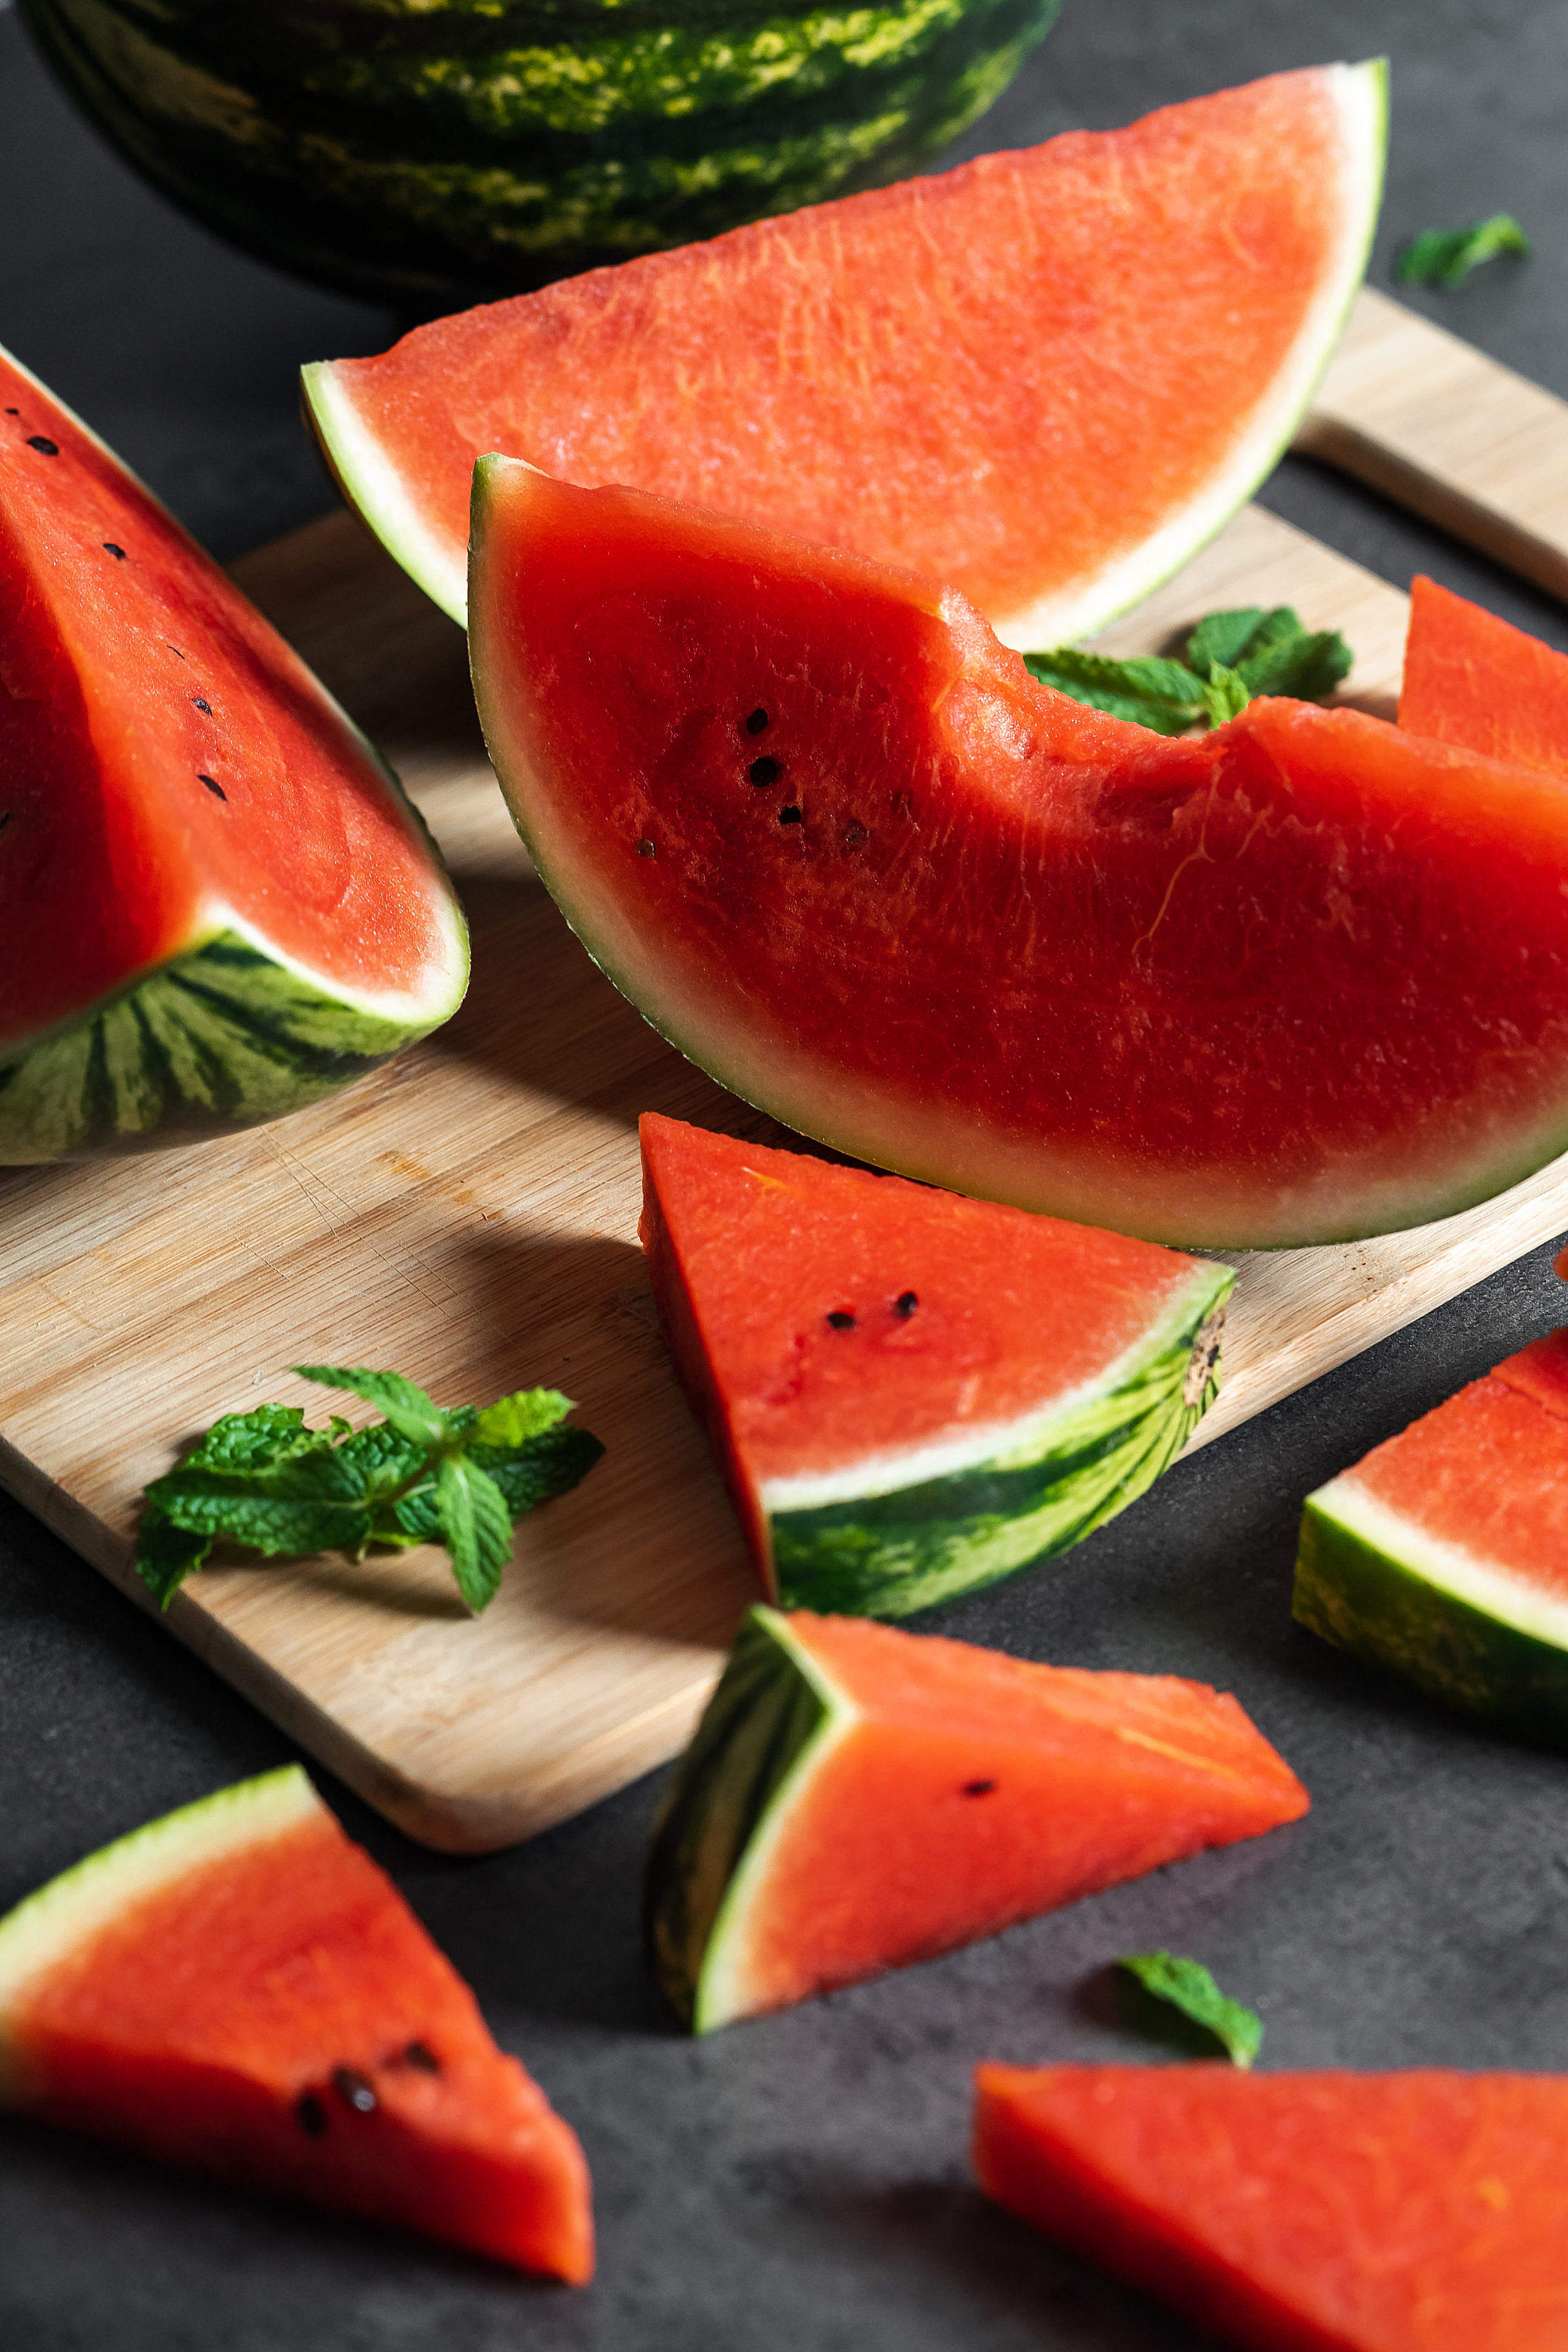 Slices of Fresh Watermelon Free Stock Photo